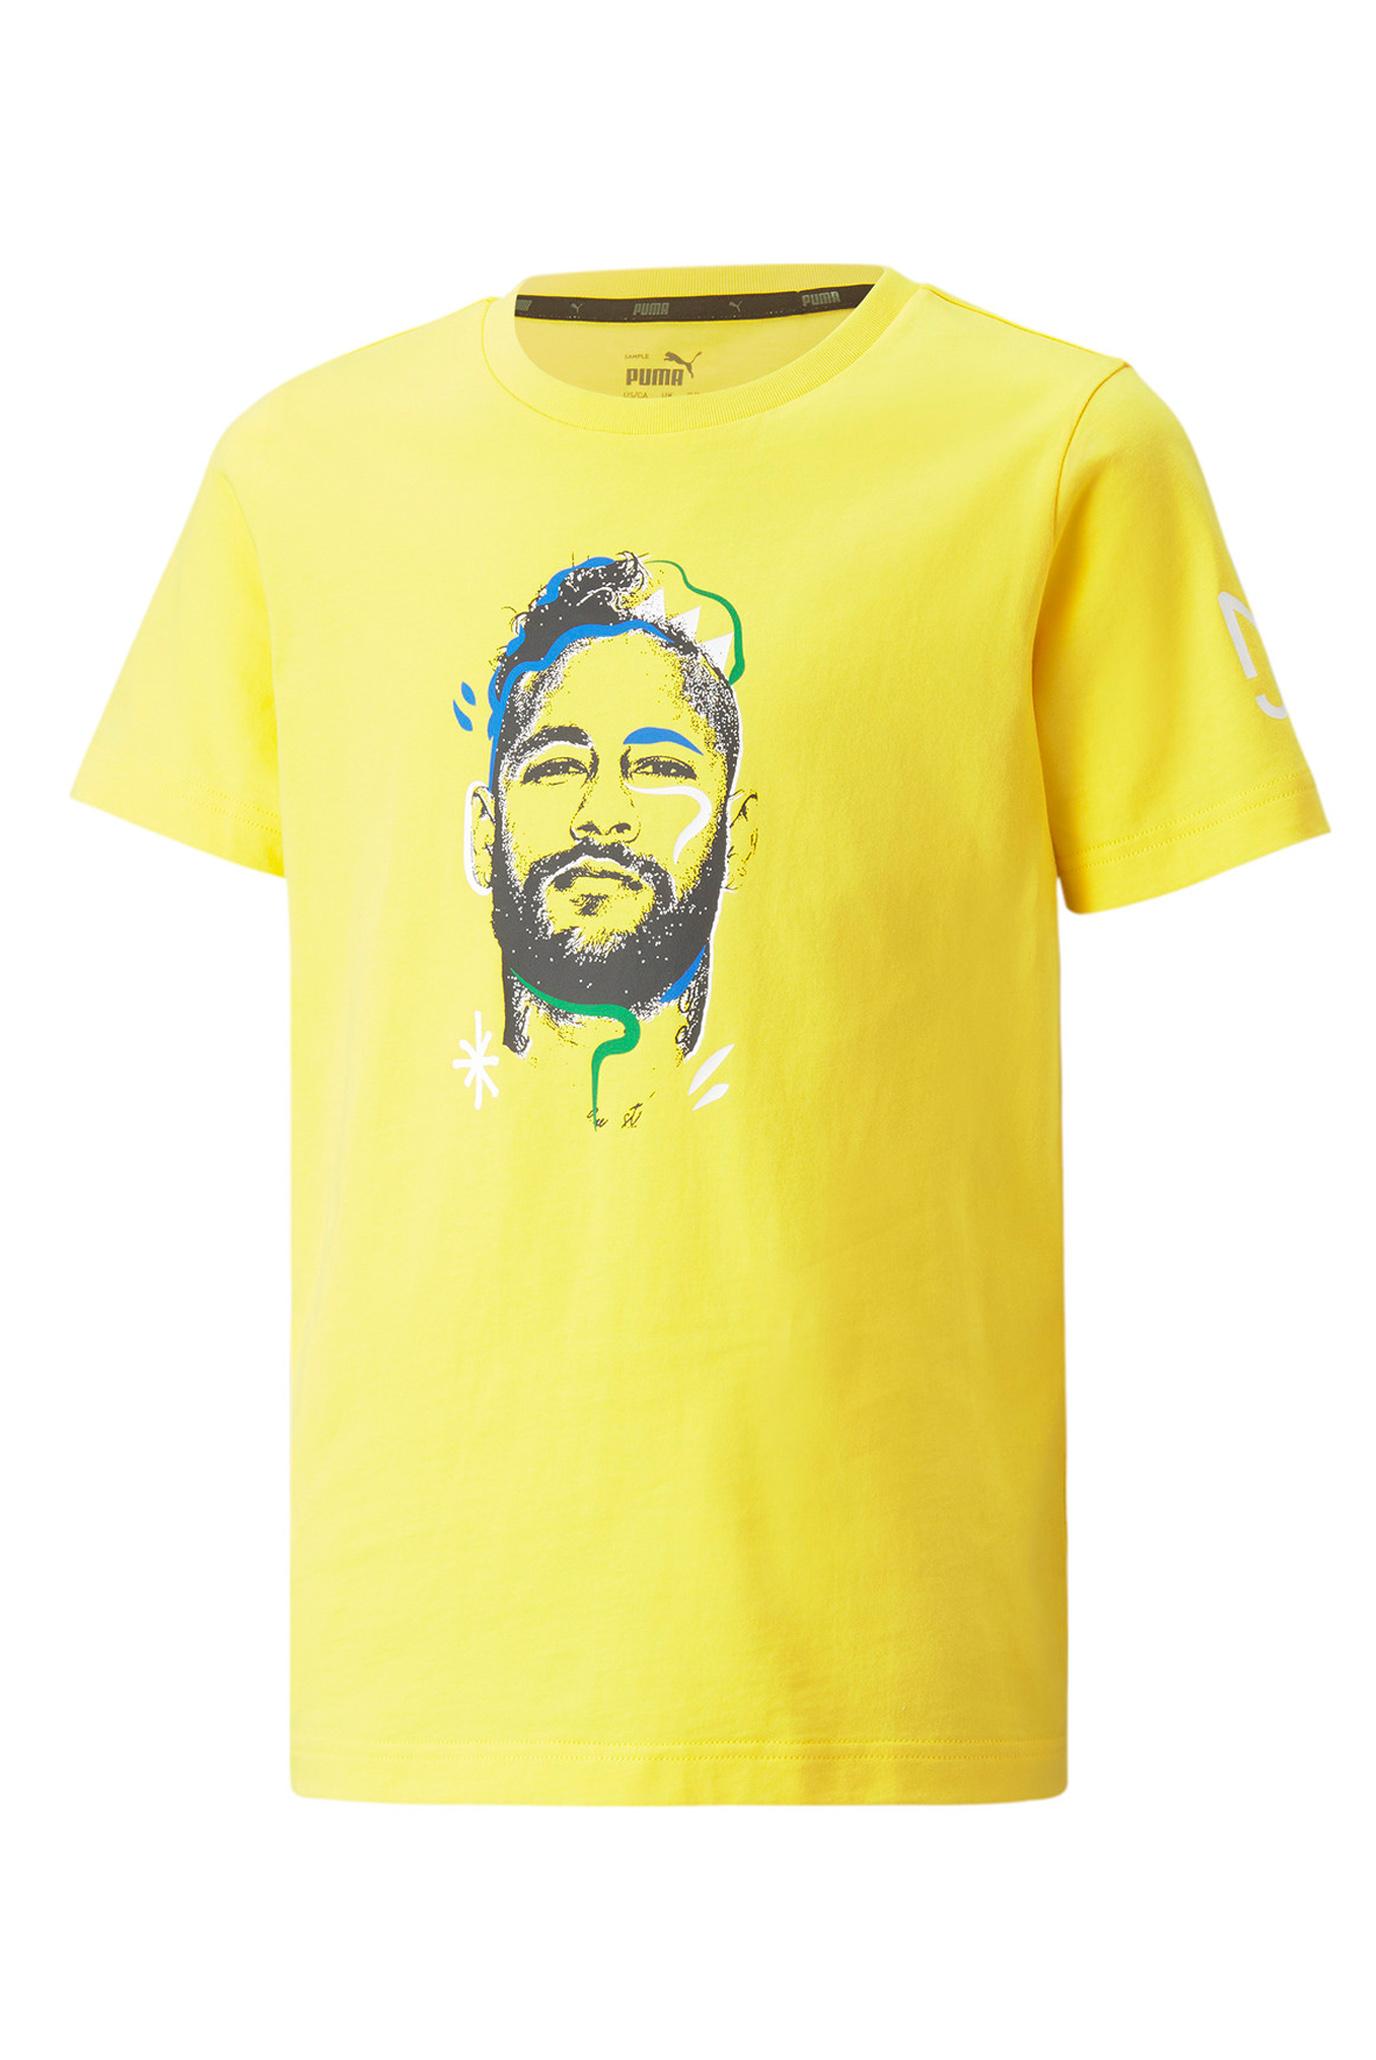 Футболка Neymar Jr Graphic Youth Tee 1